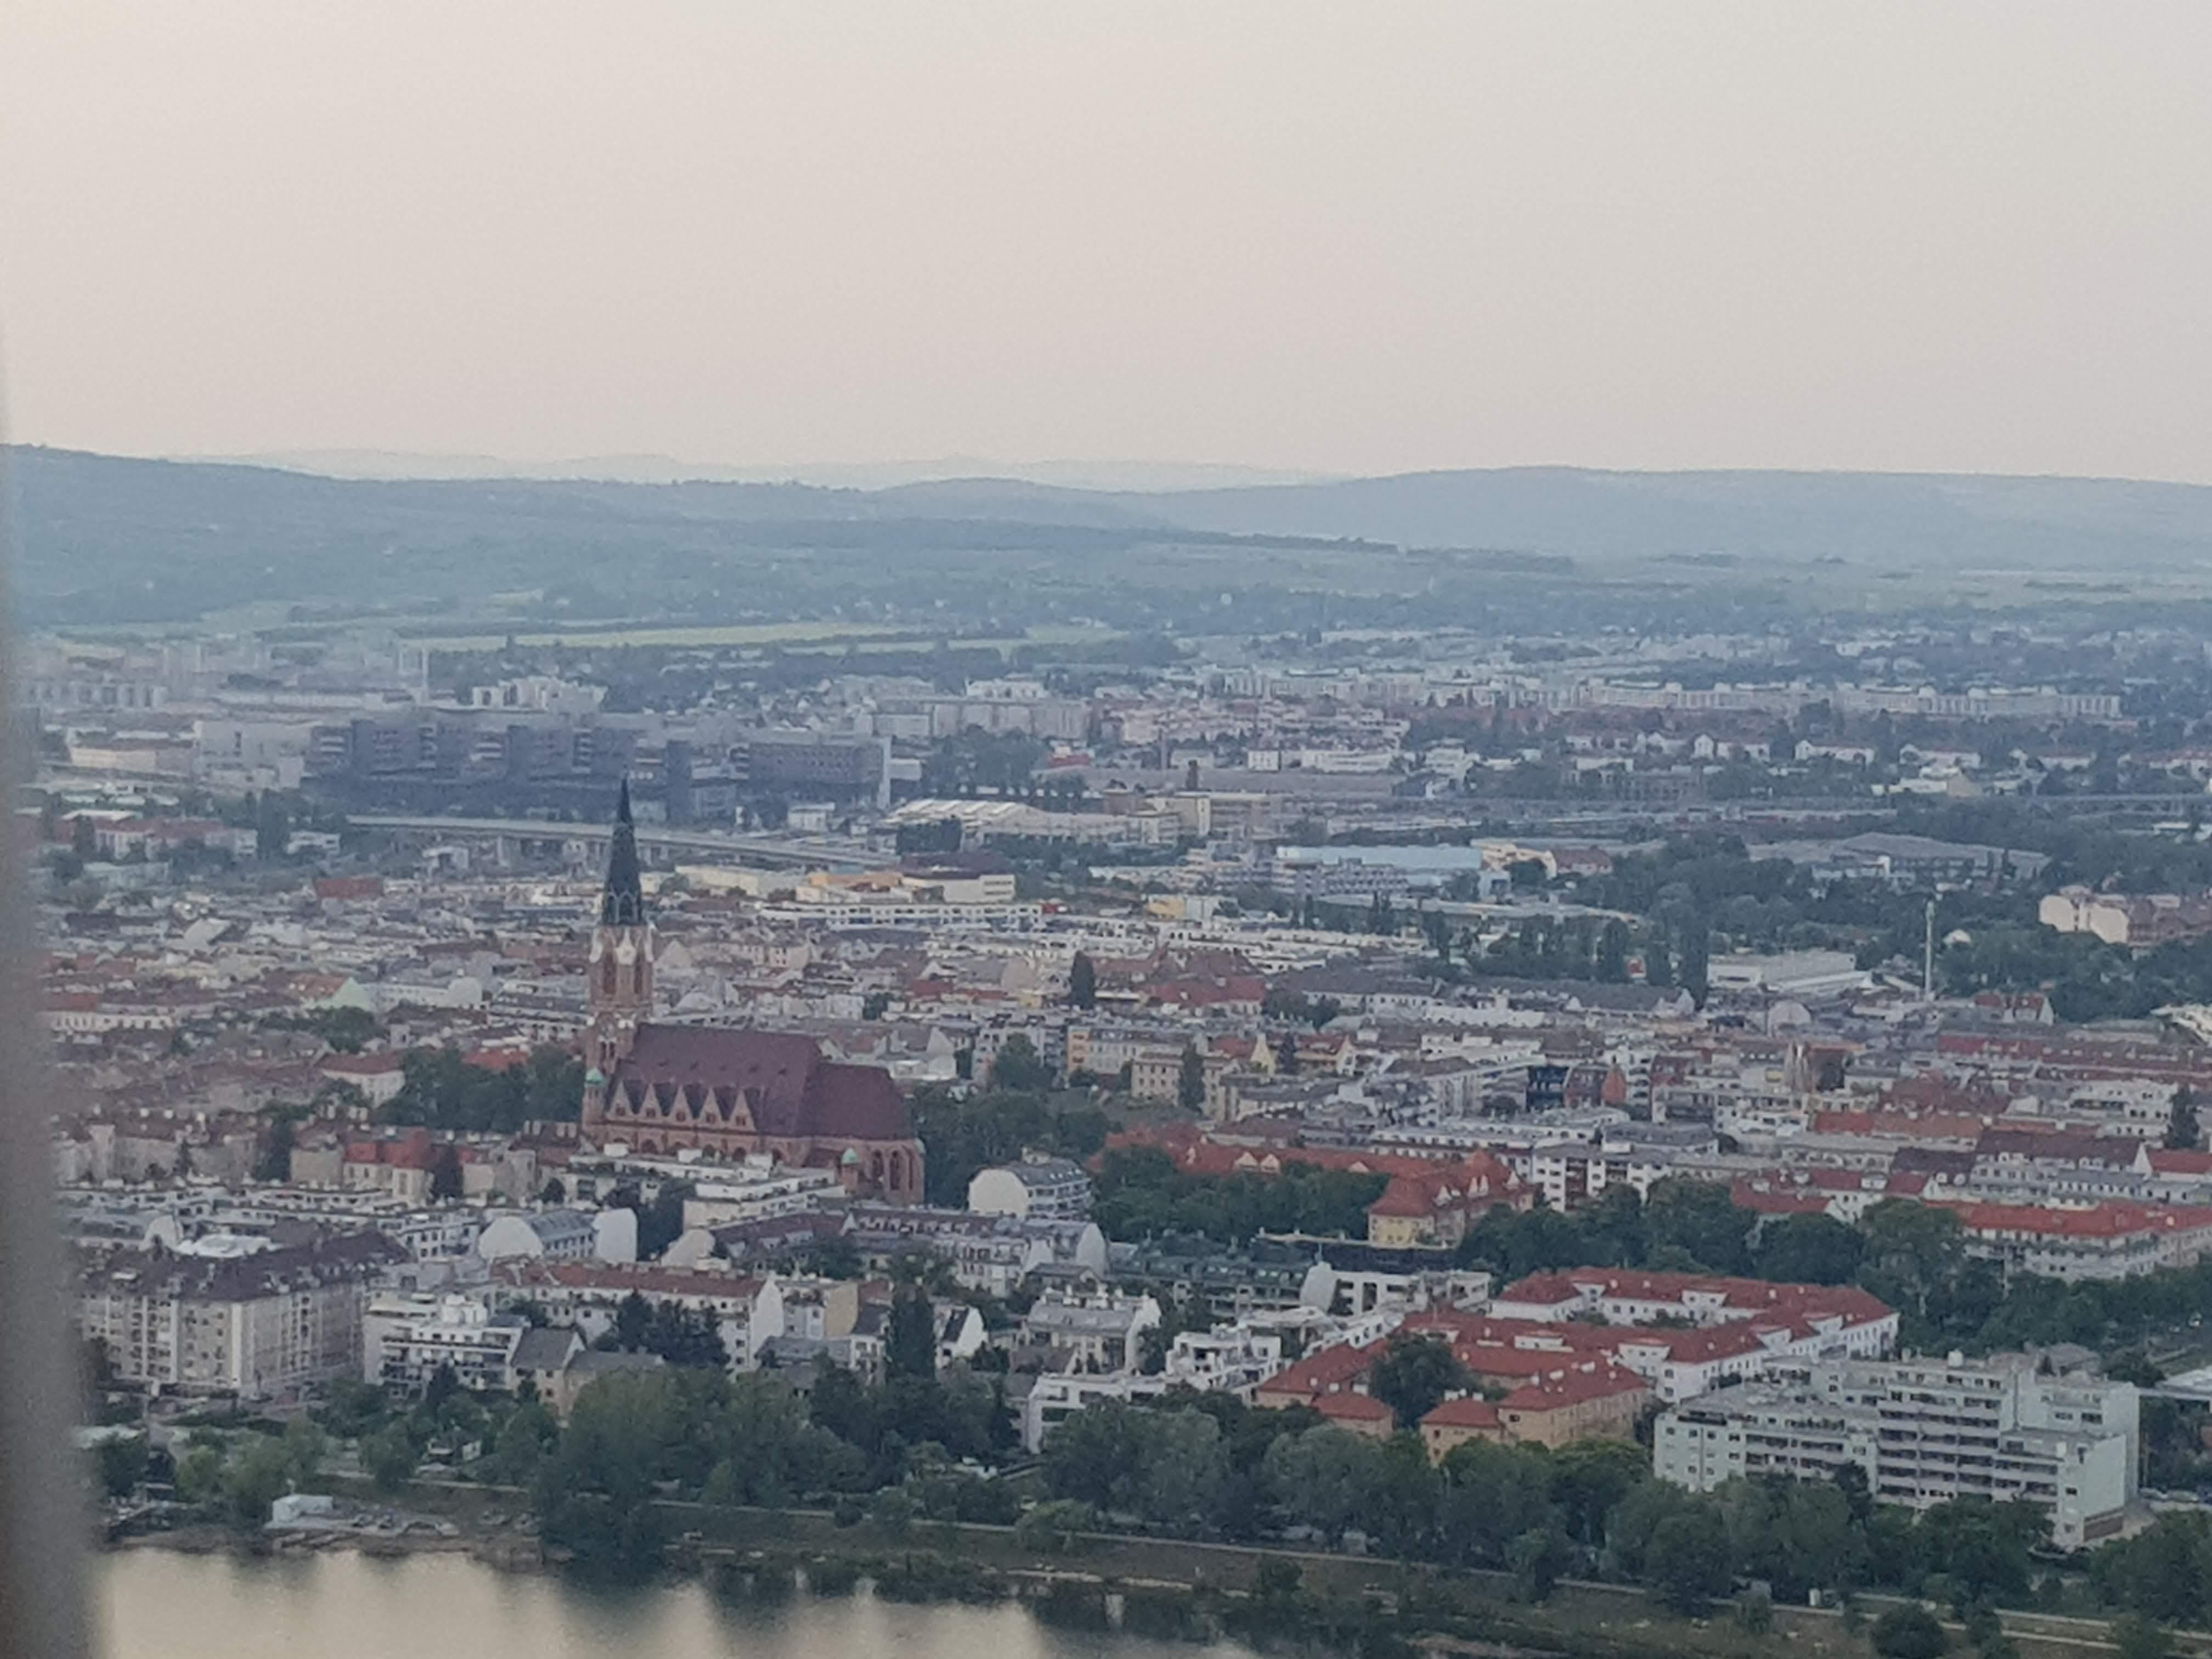 Donau Tower view